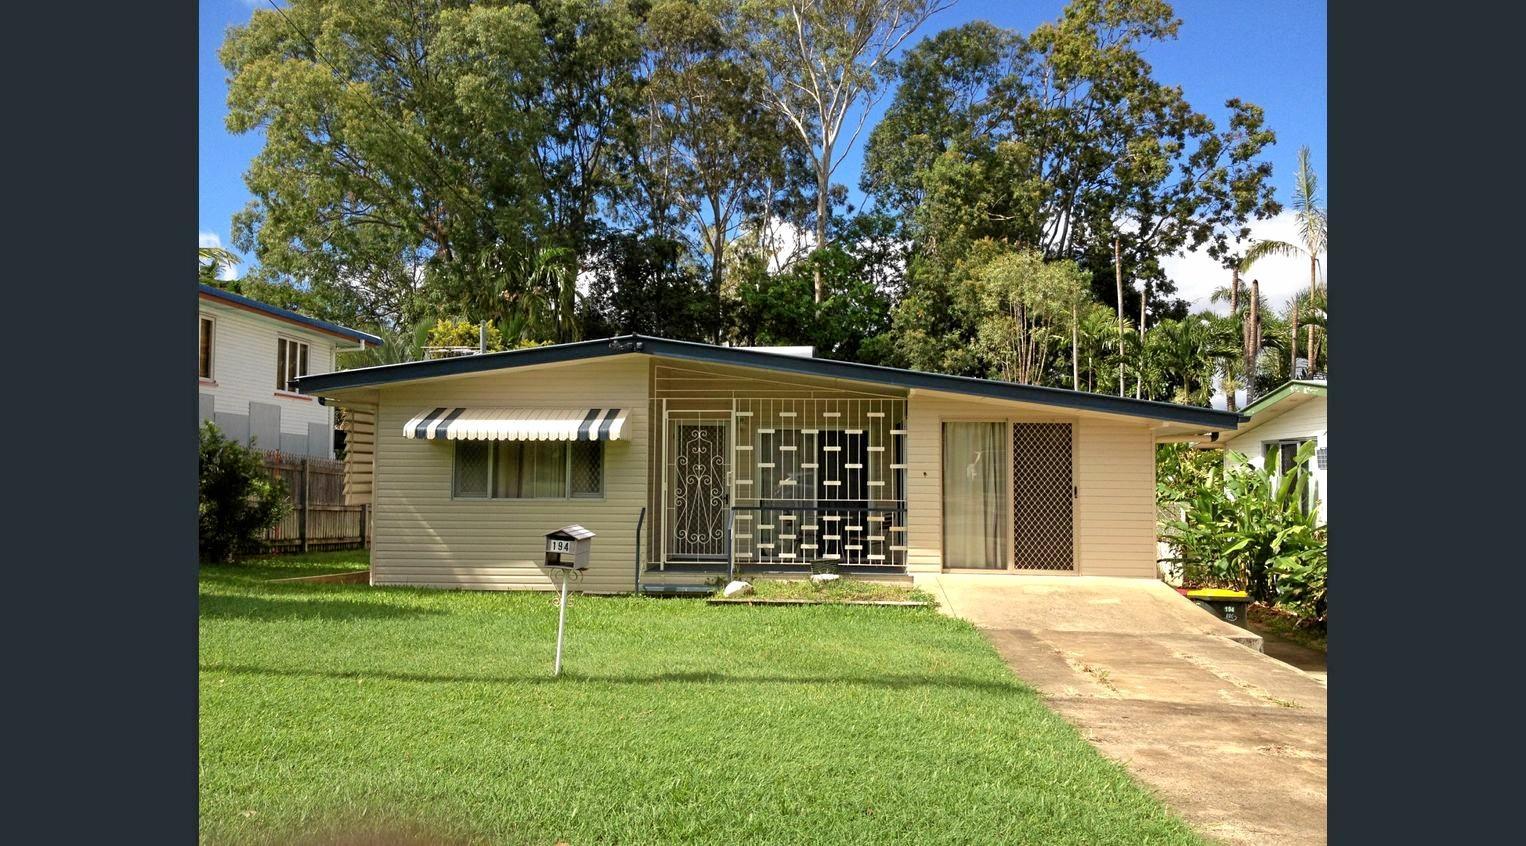 194 Schmidt St, Frenchville was listed for $250 by LJ Hooker Rockhampton.